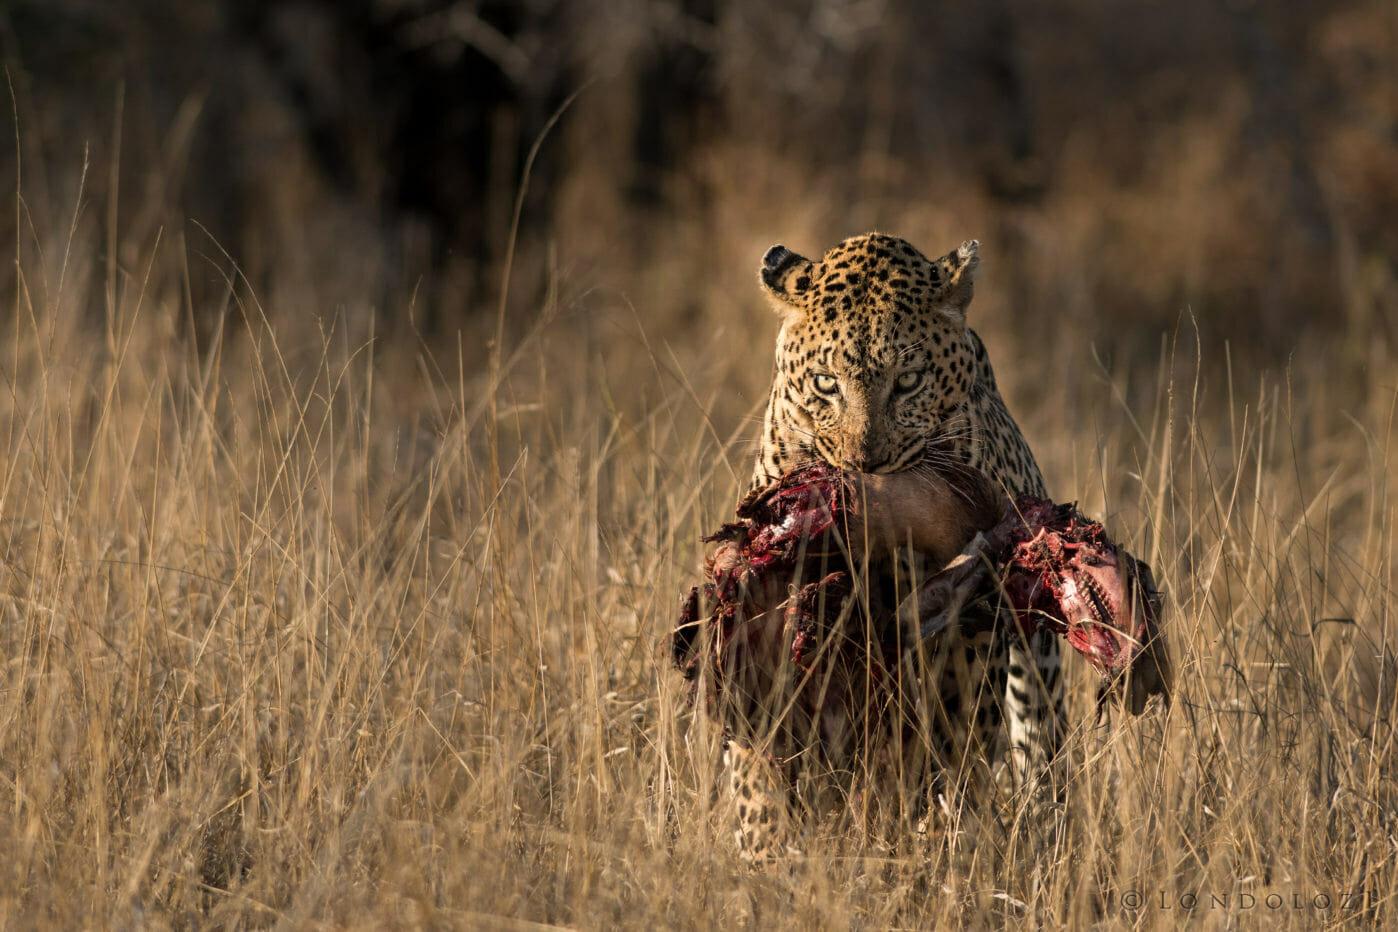 Londolozi's Inyatini Male leopard carrying an impala kill by Grant Rodewijk